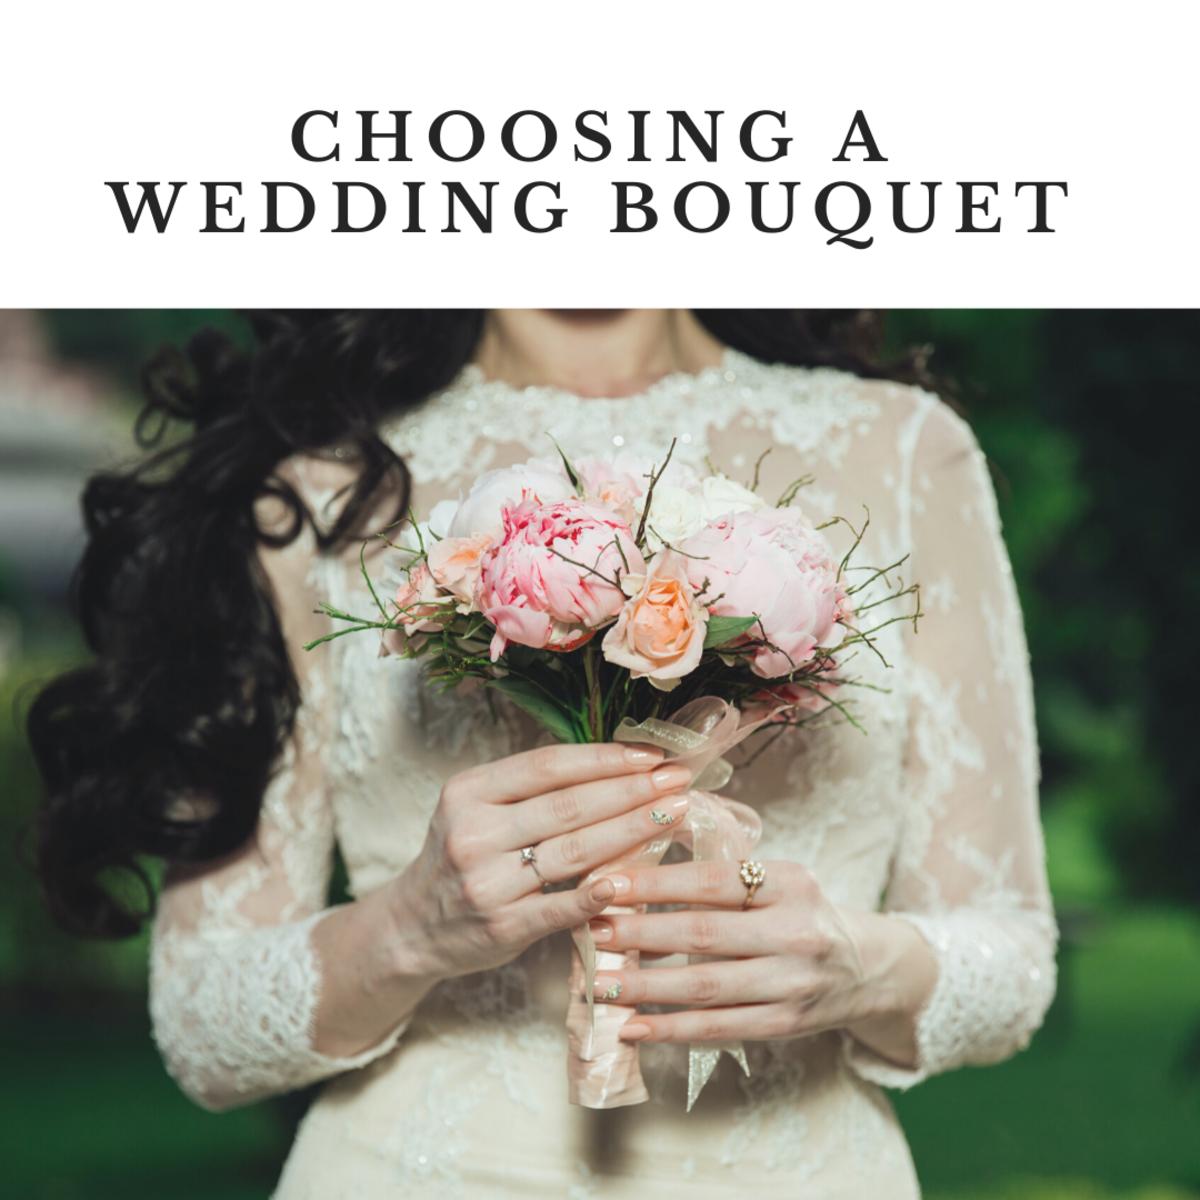 Choosing a Wedding Bouquet